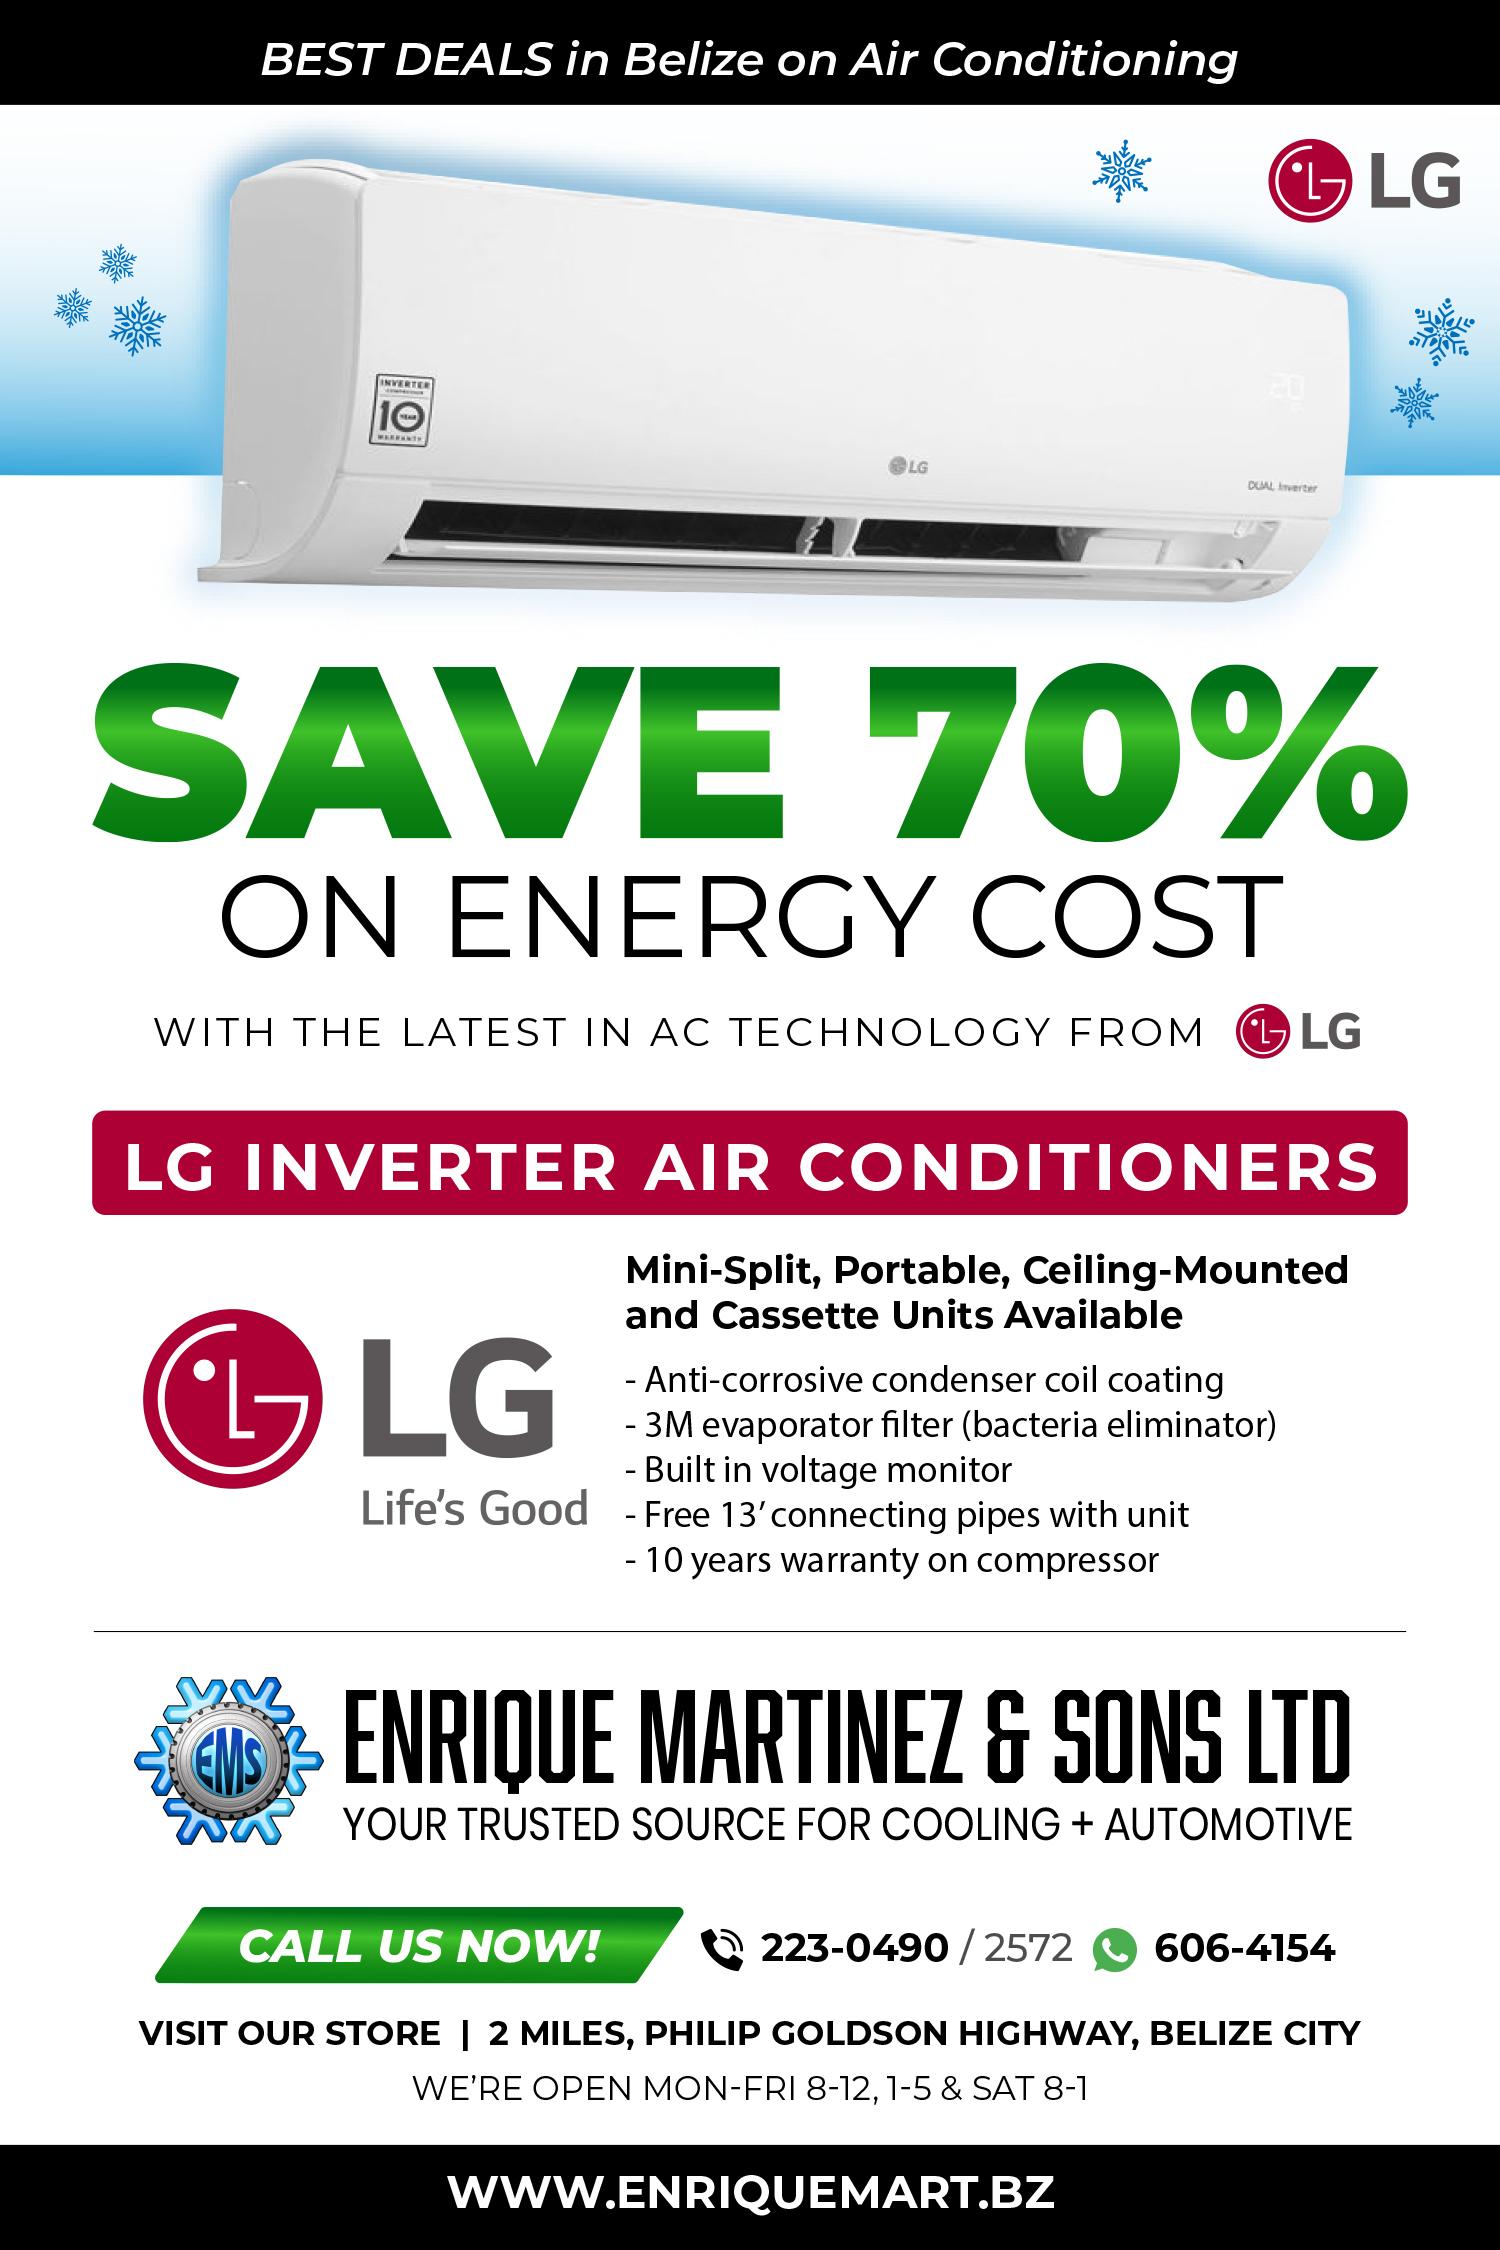 Advertisement for LG Inverter Air Conditioners distributed Enrique Martinez & Sons Ltd Belize